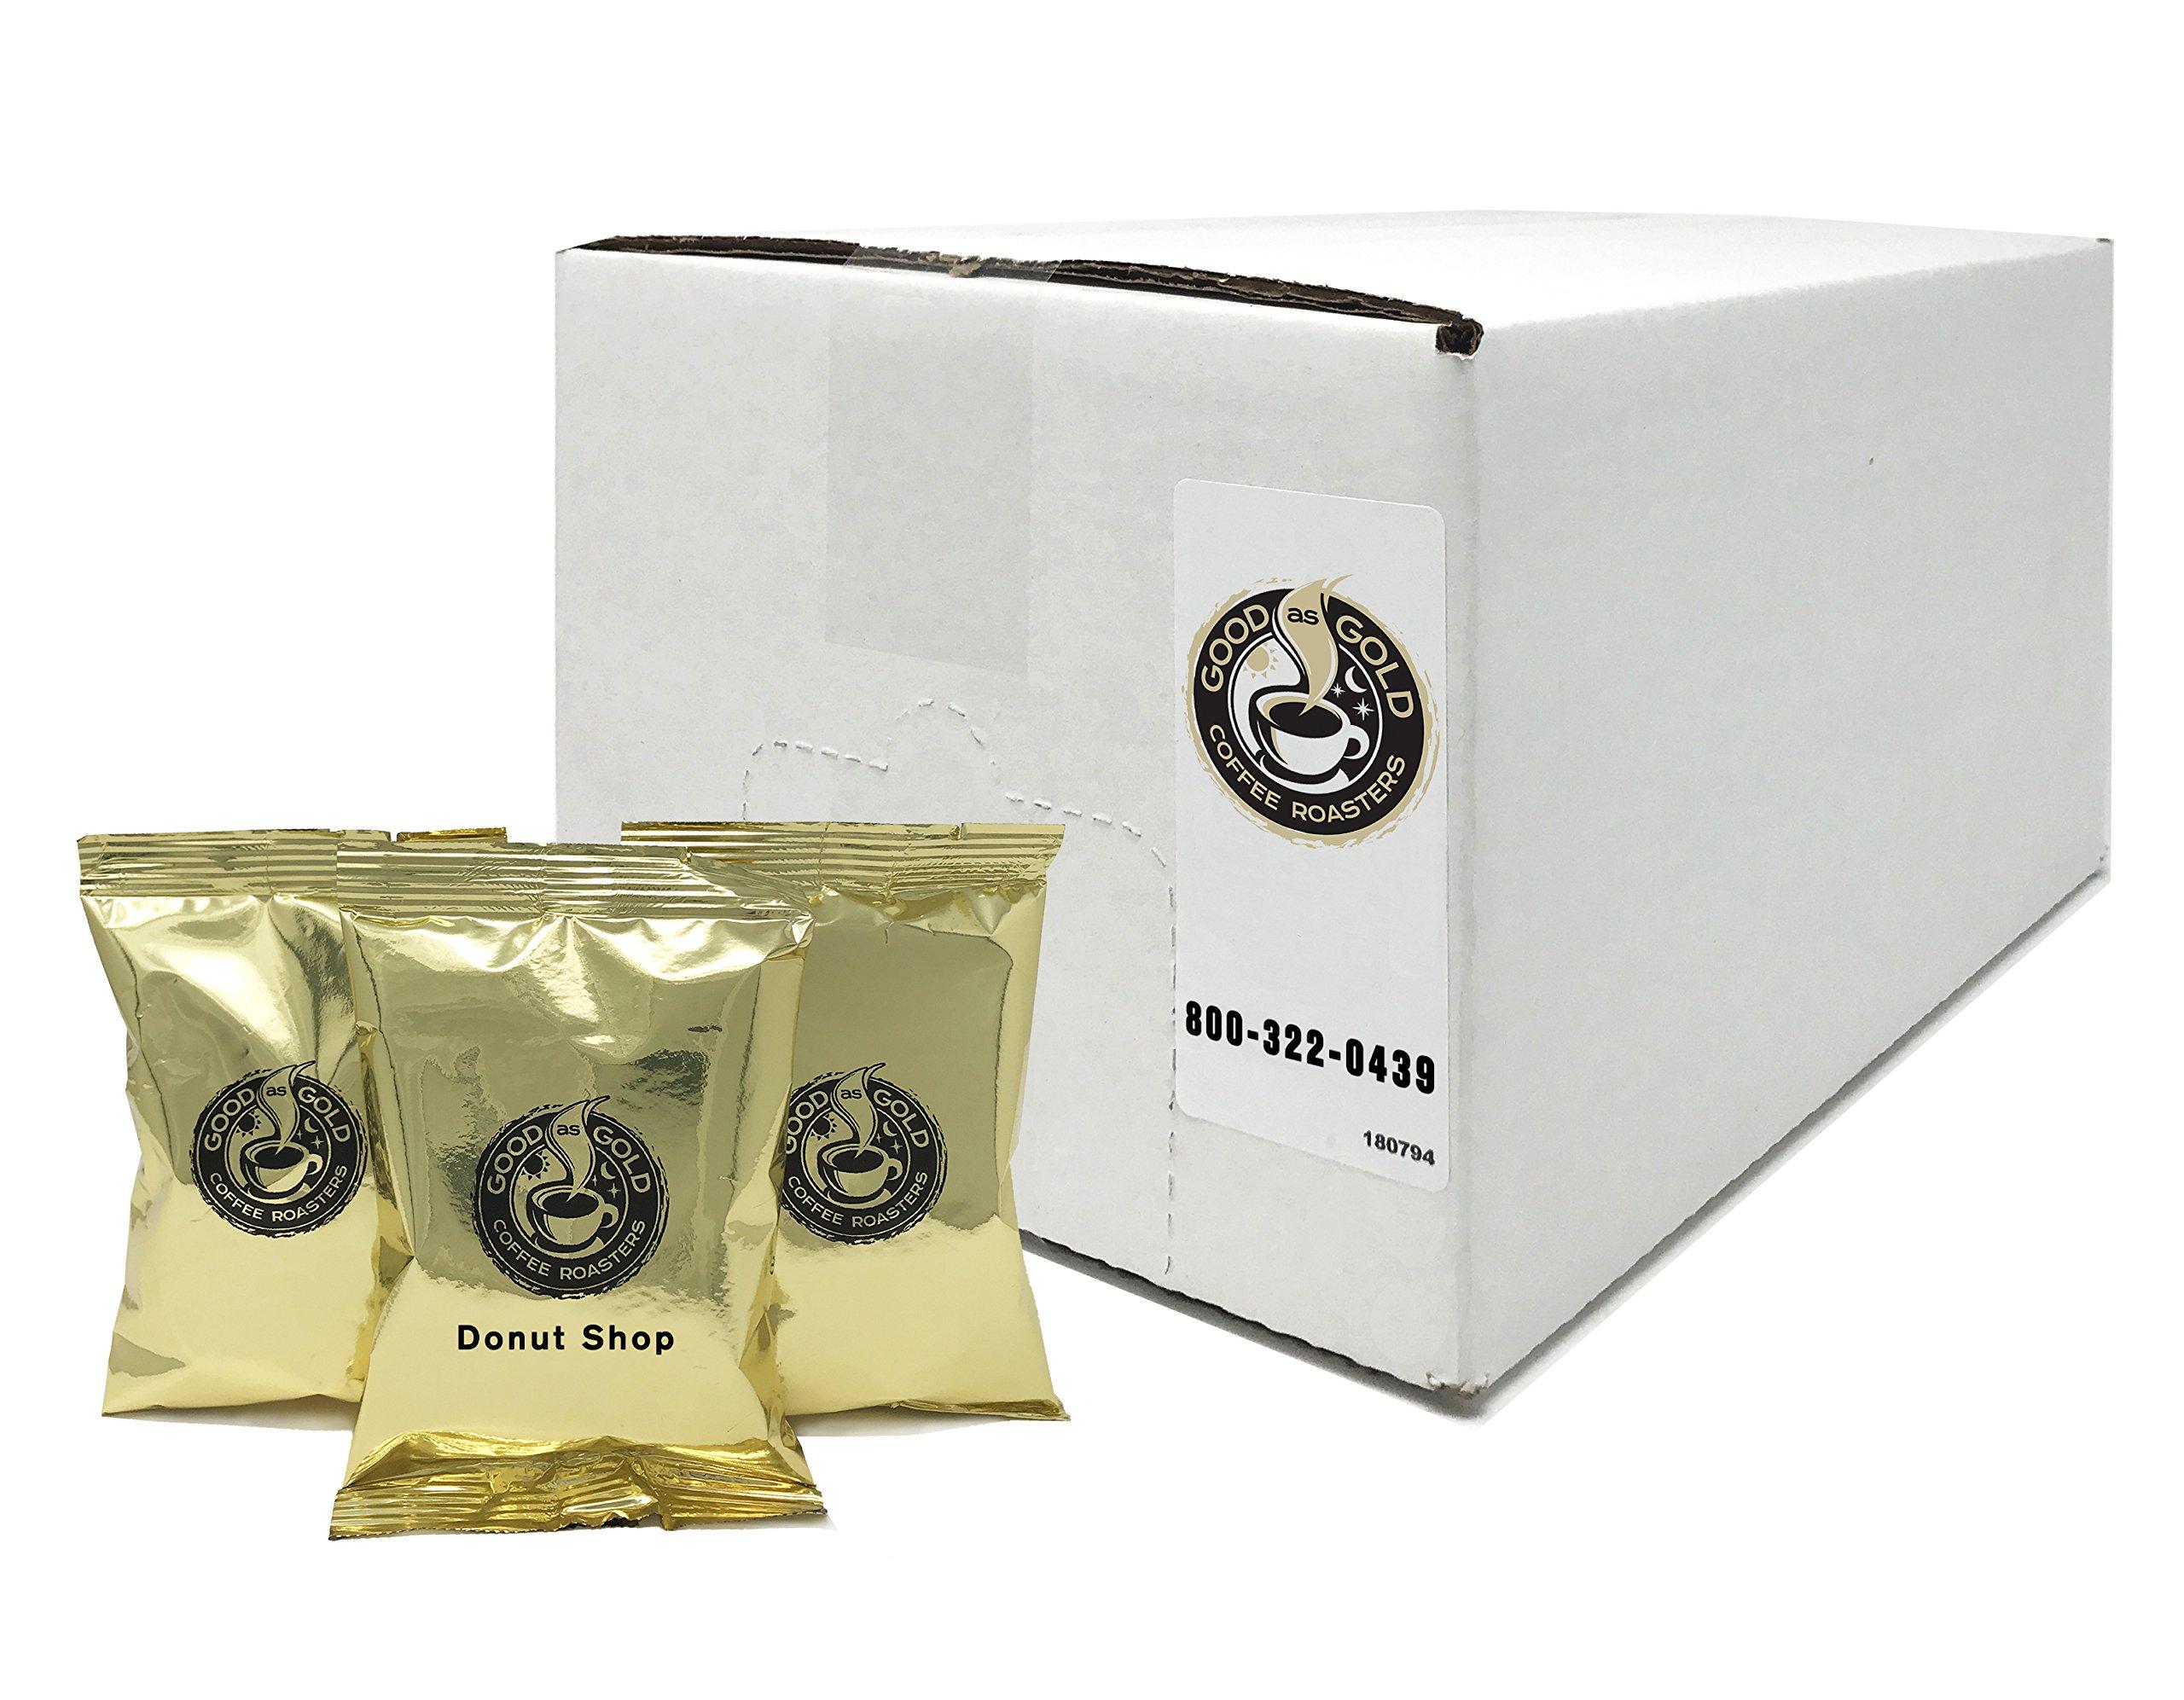 Donut Shop Coffee Pouches, Good As Gold Coffee (40/2.0oz Pre measured coffee packets), Premium 100% Arabica Medium Roast Blend